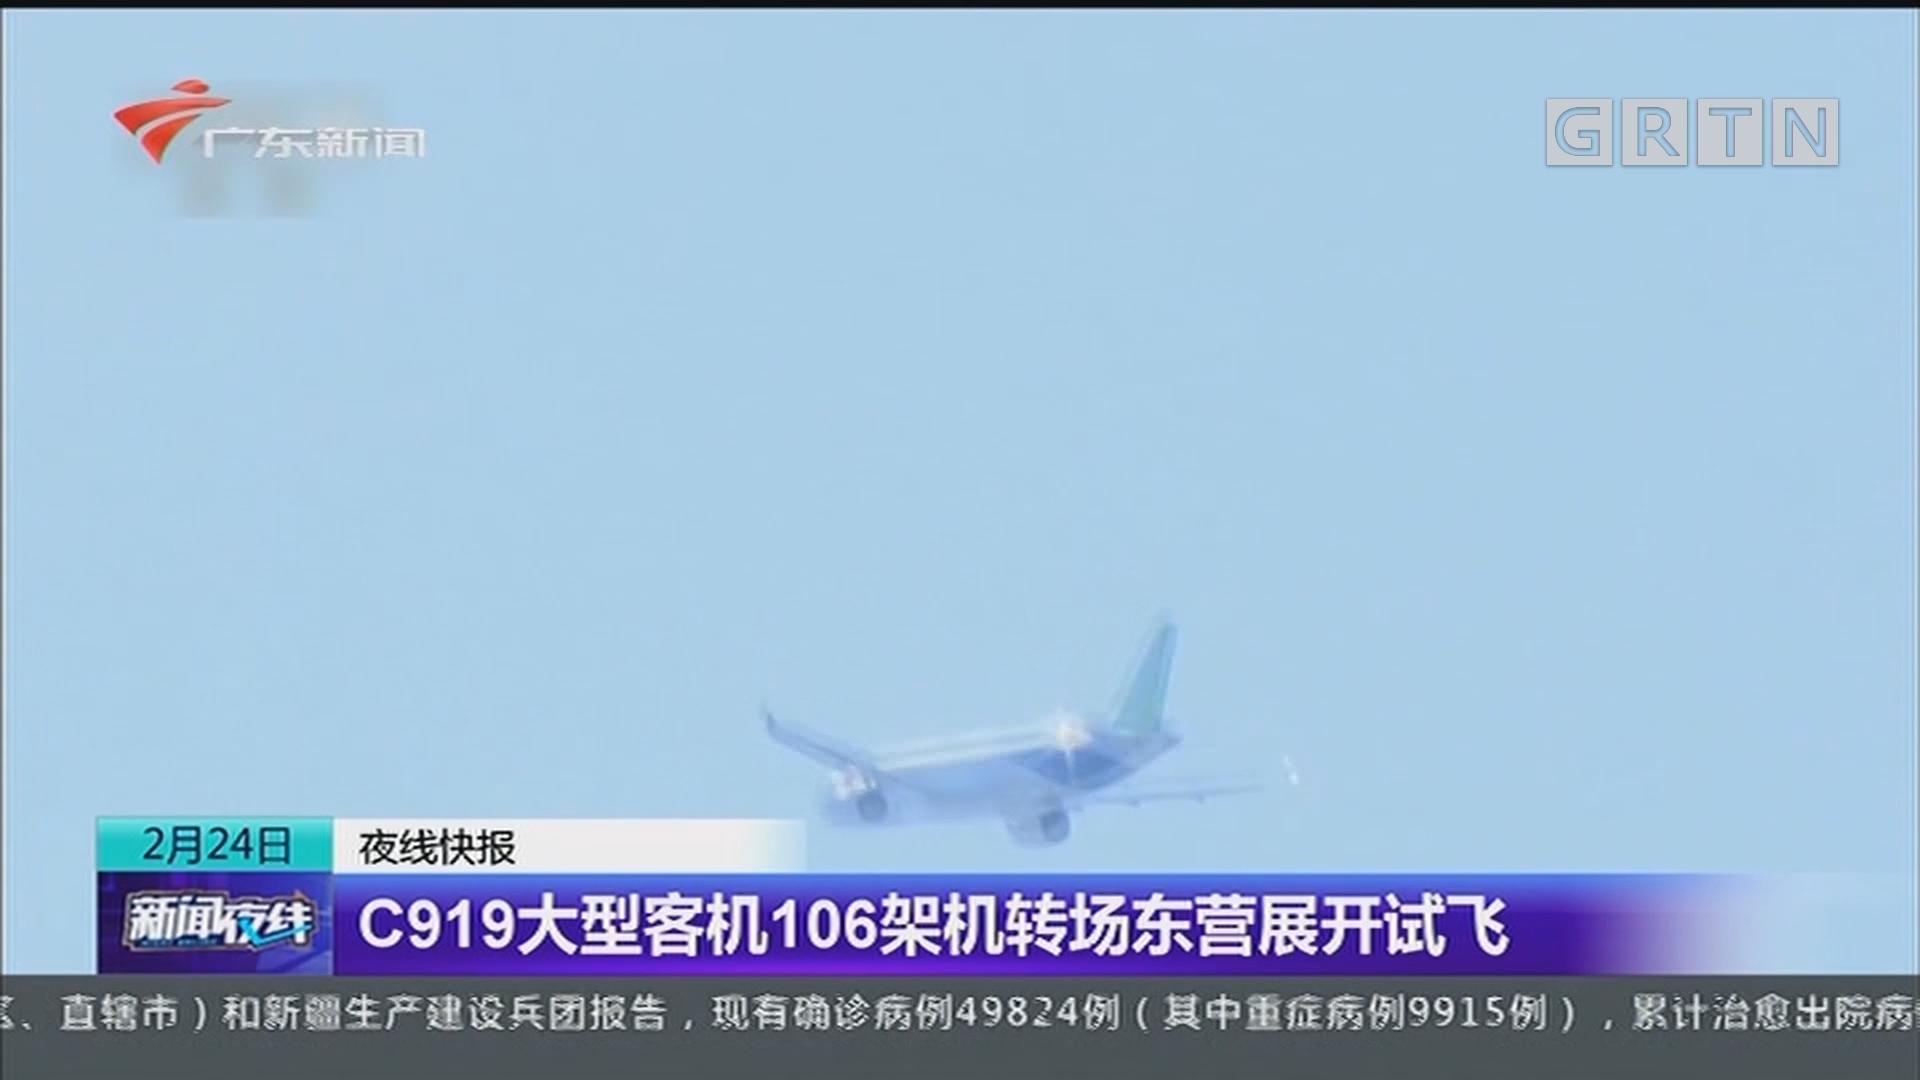 C919大型客机106架机转场东营展开试飞